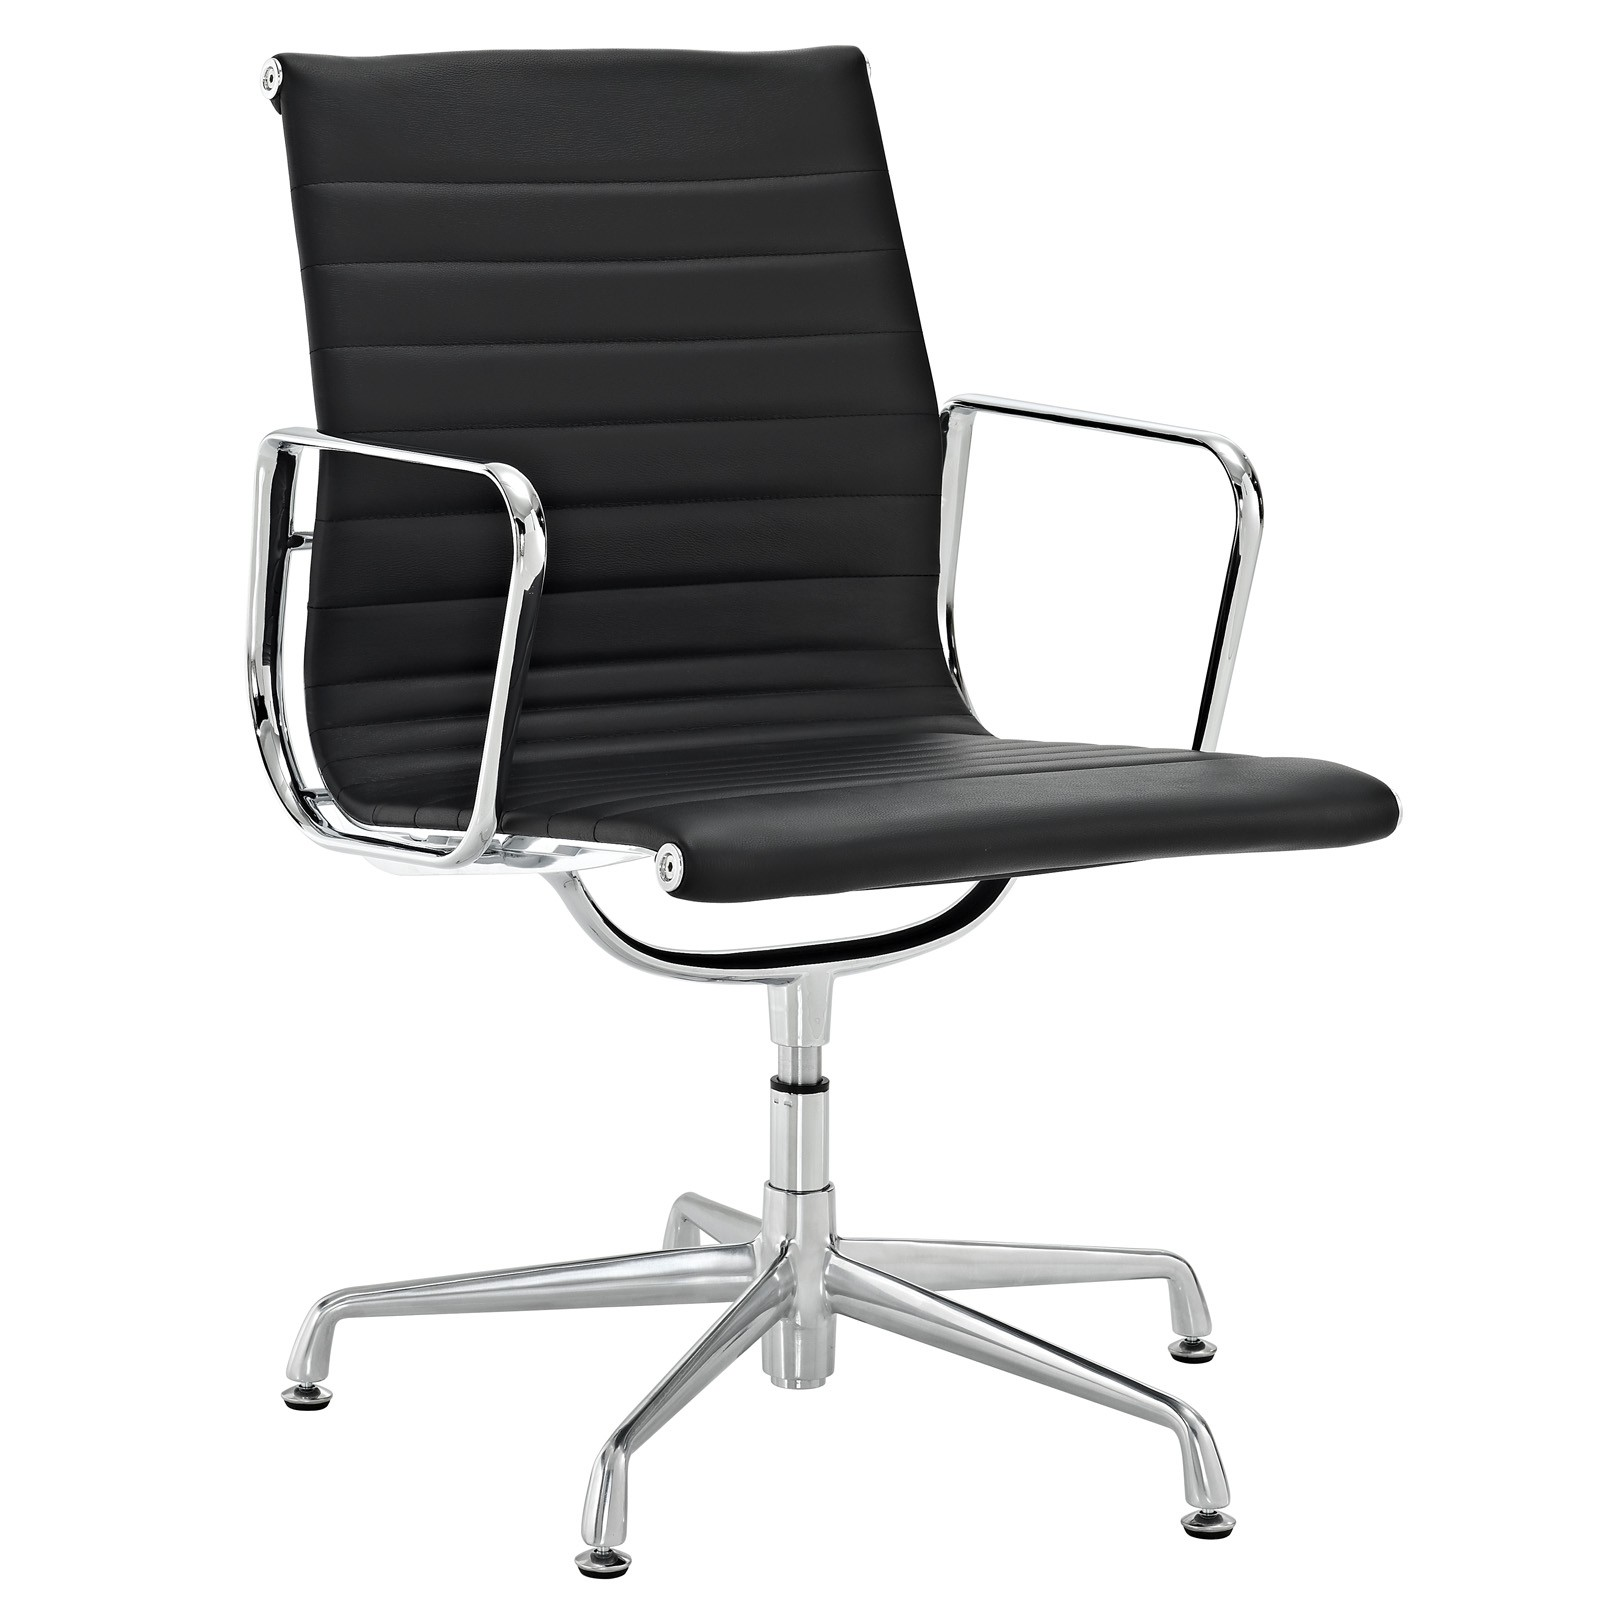 Office Chair Leaning To One Side Garden Metal Folding Chairs La Renaissance Du Design Xx Mobilier International 1957